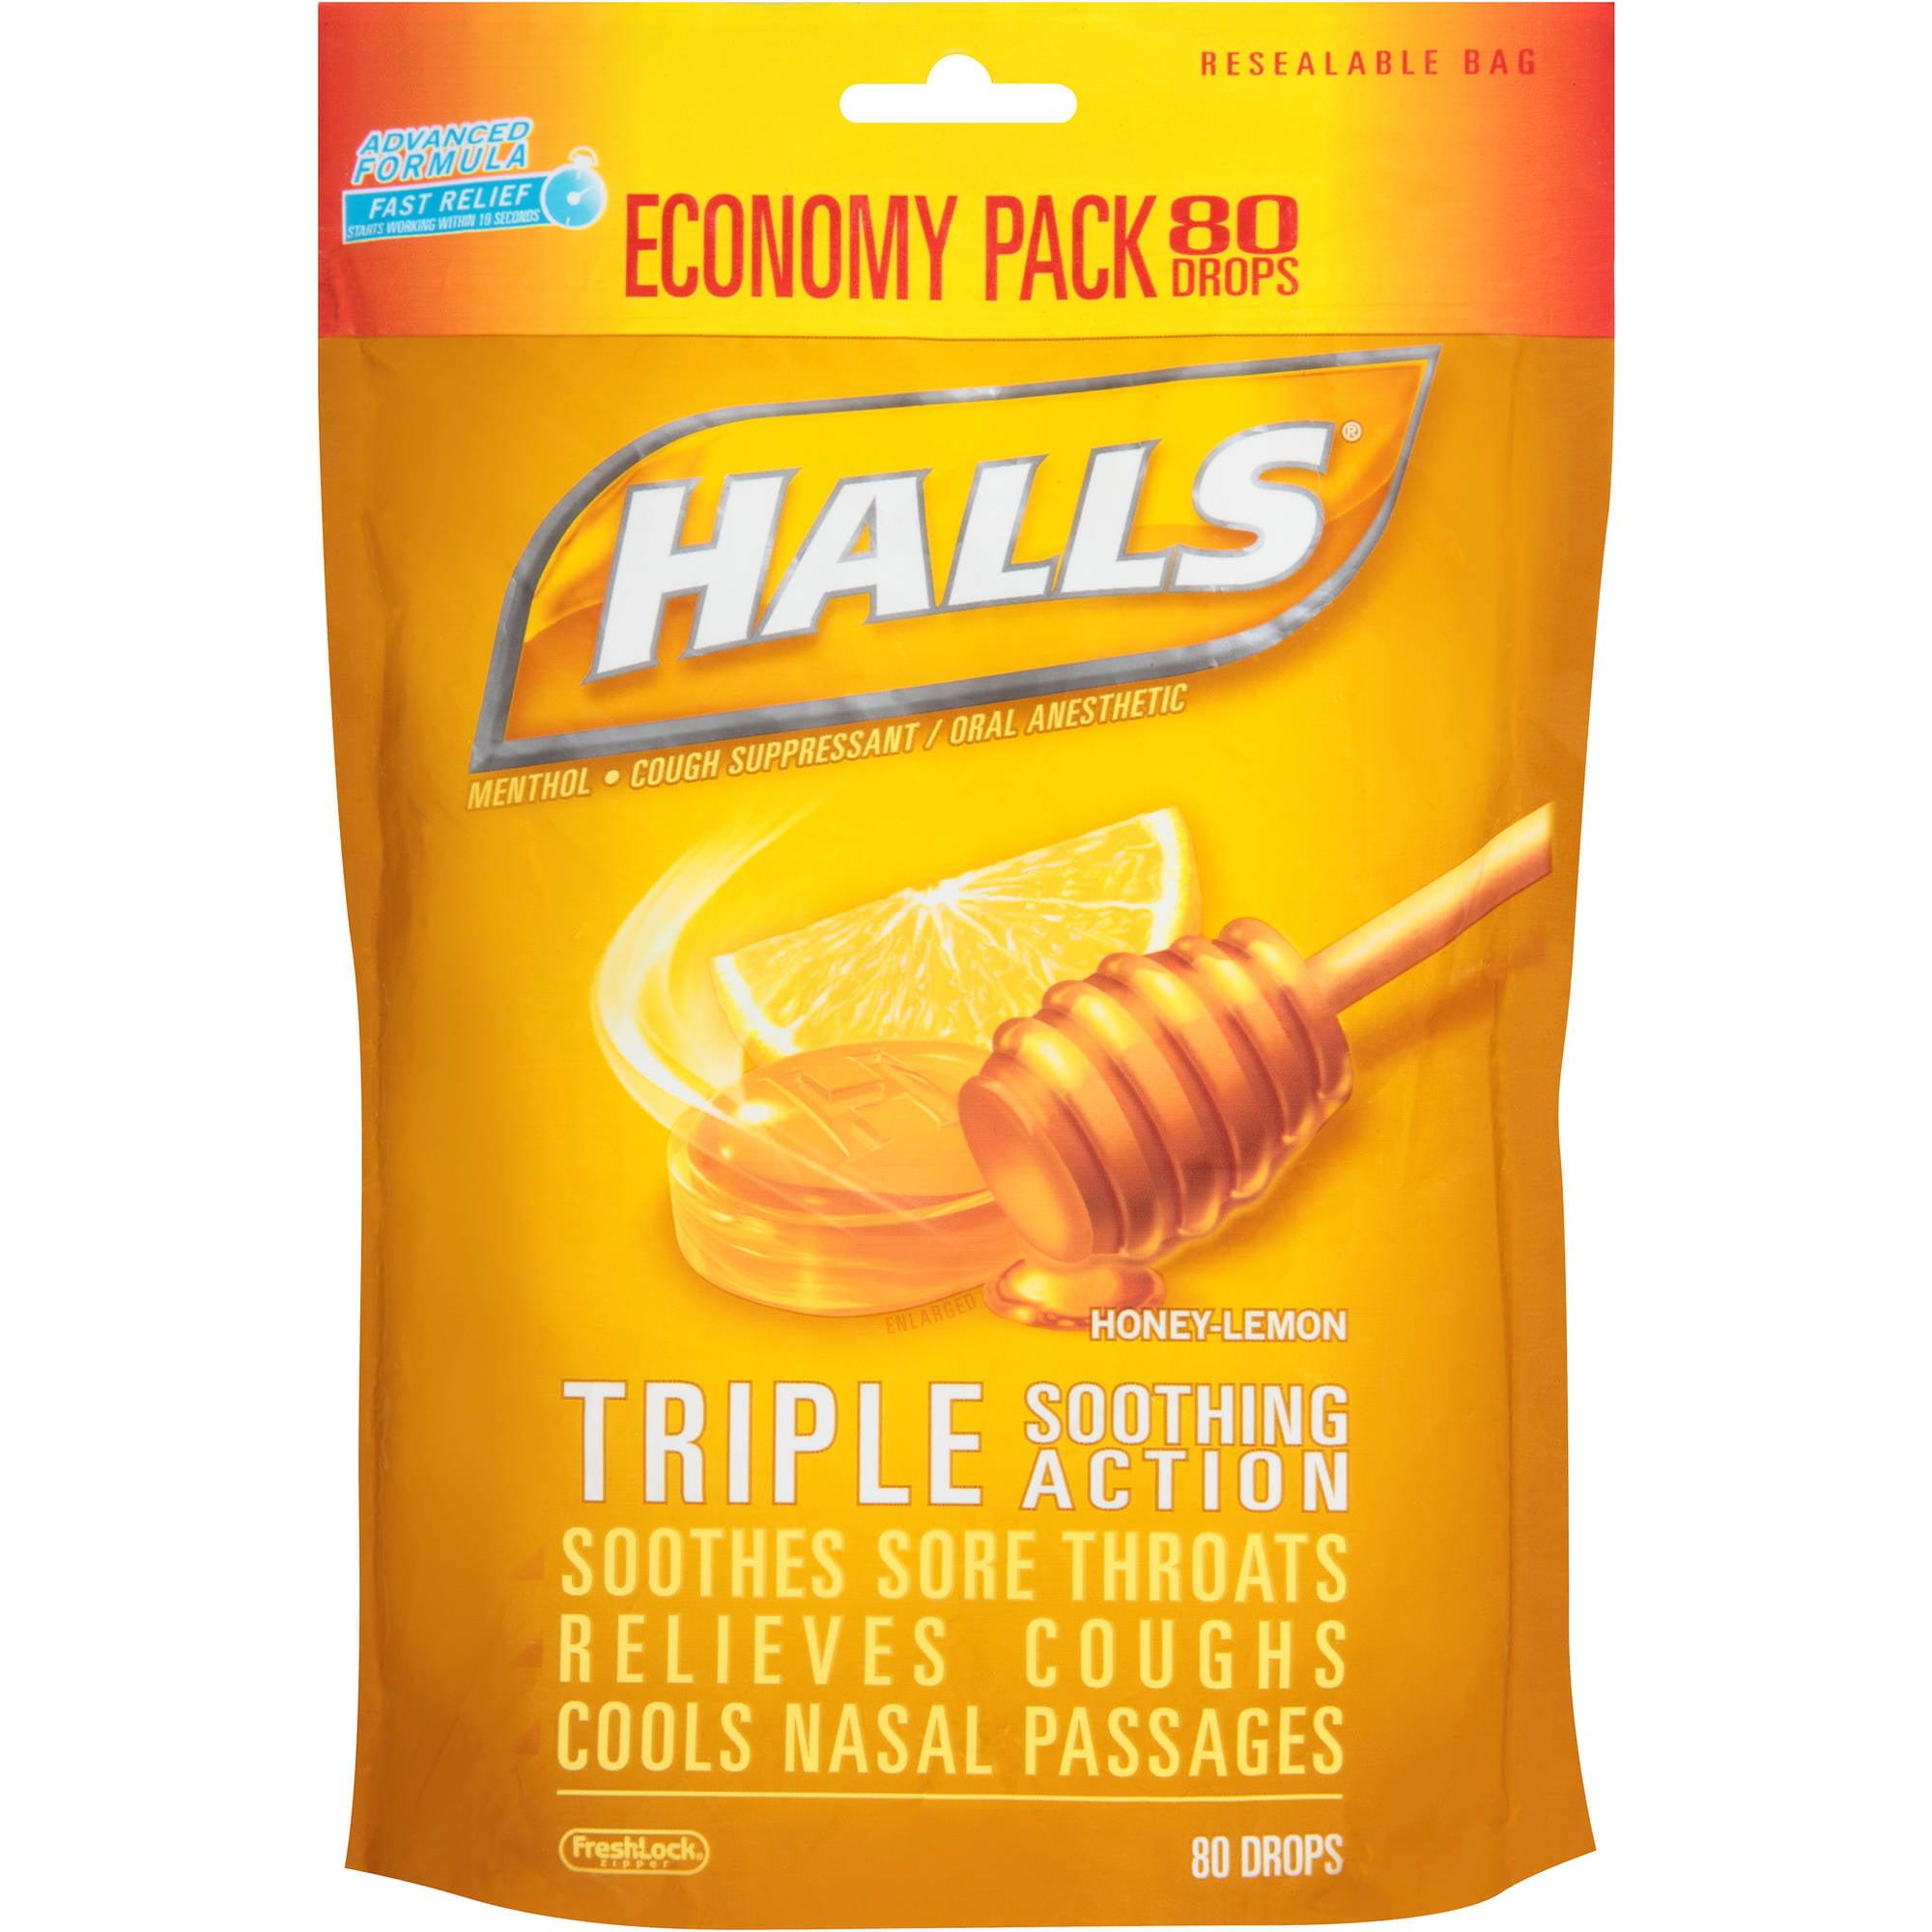 Halls Honey-Lemon Menthol Drops Cough Suppressant 80 Ct